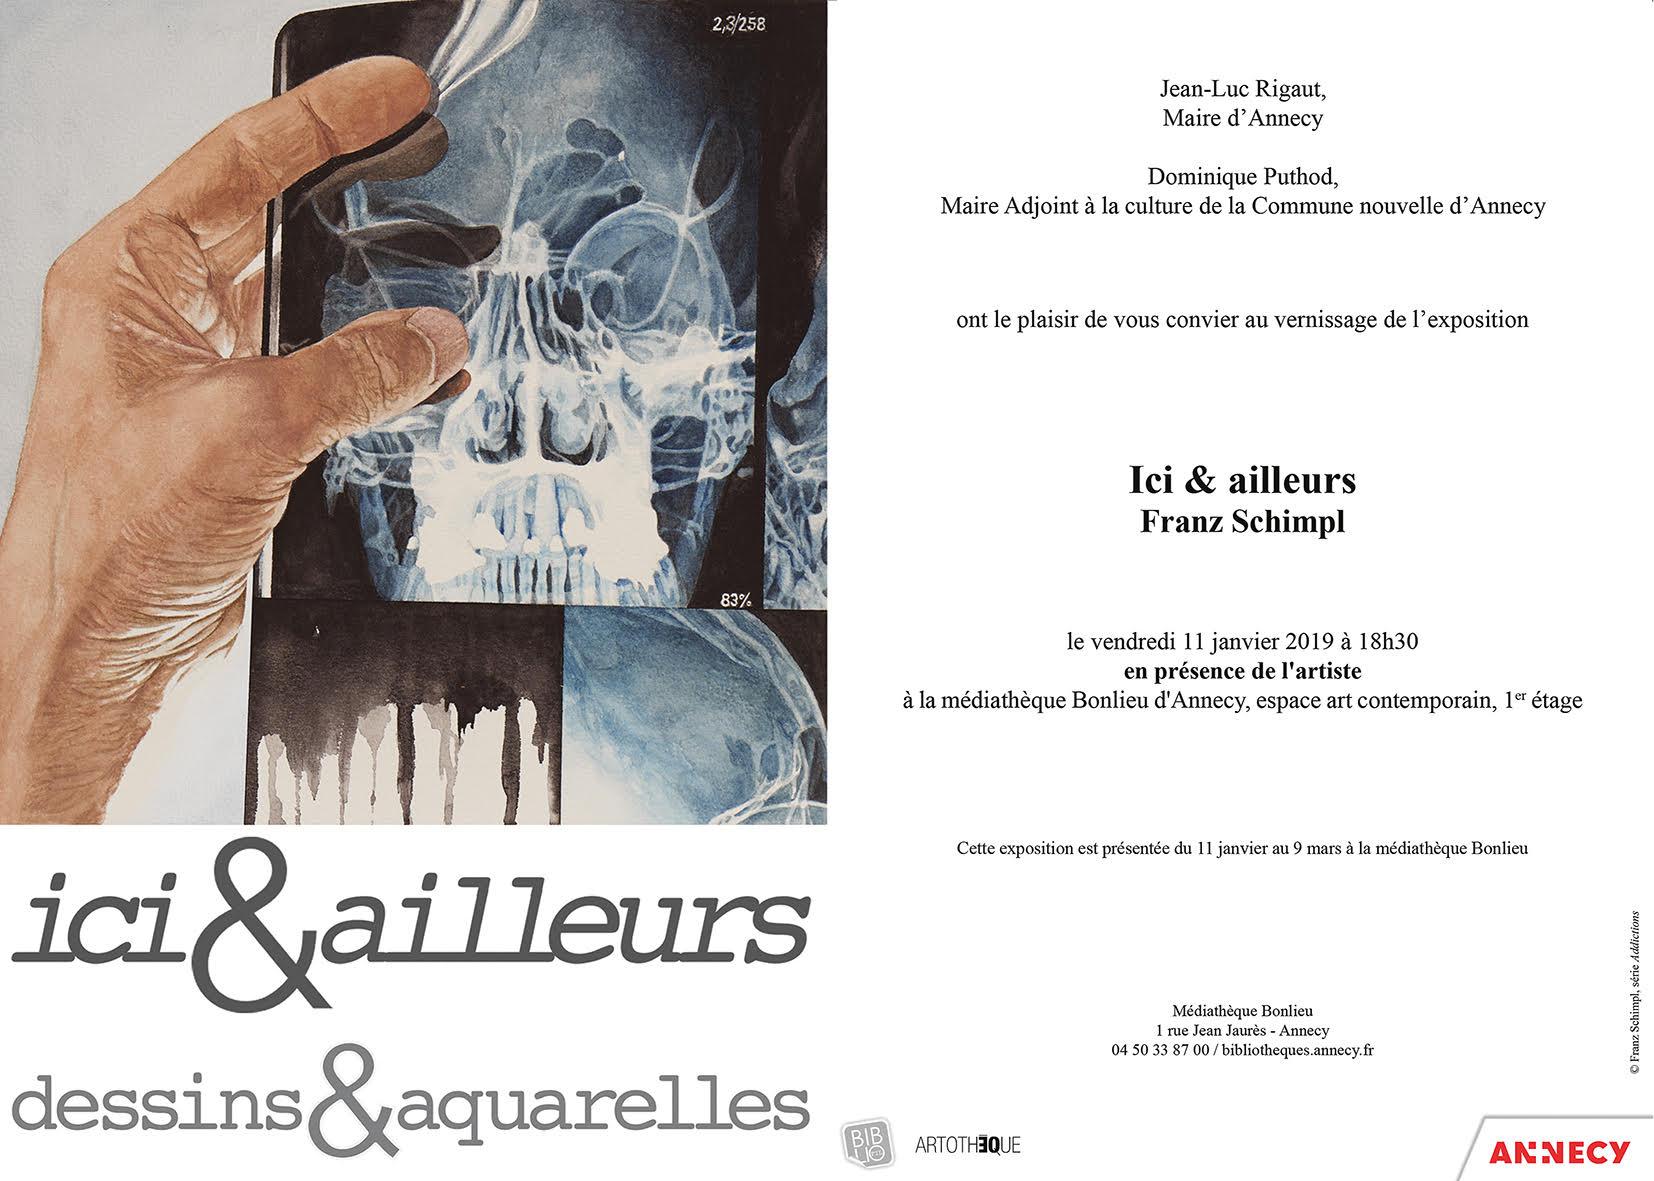 Ici & Ailleurs. Exposition de Franz Schimpl